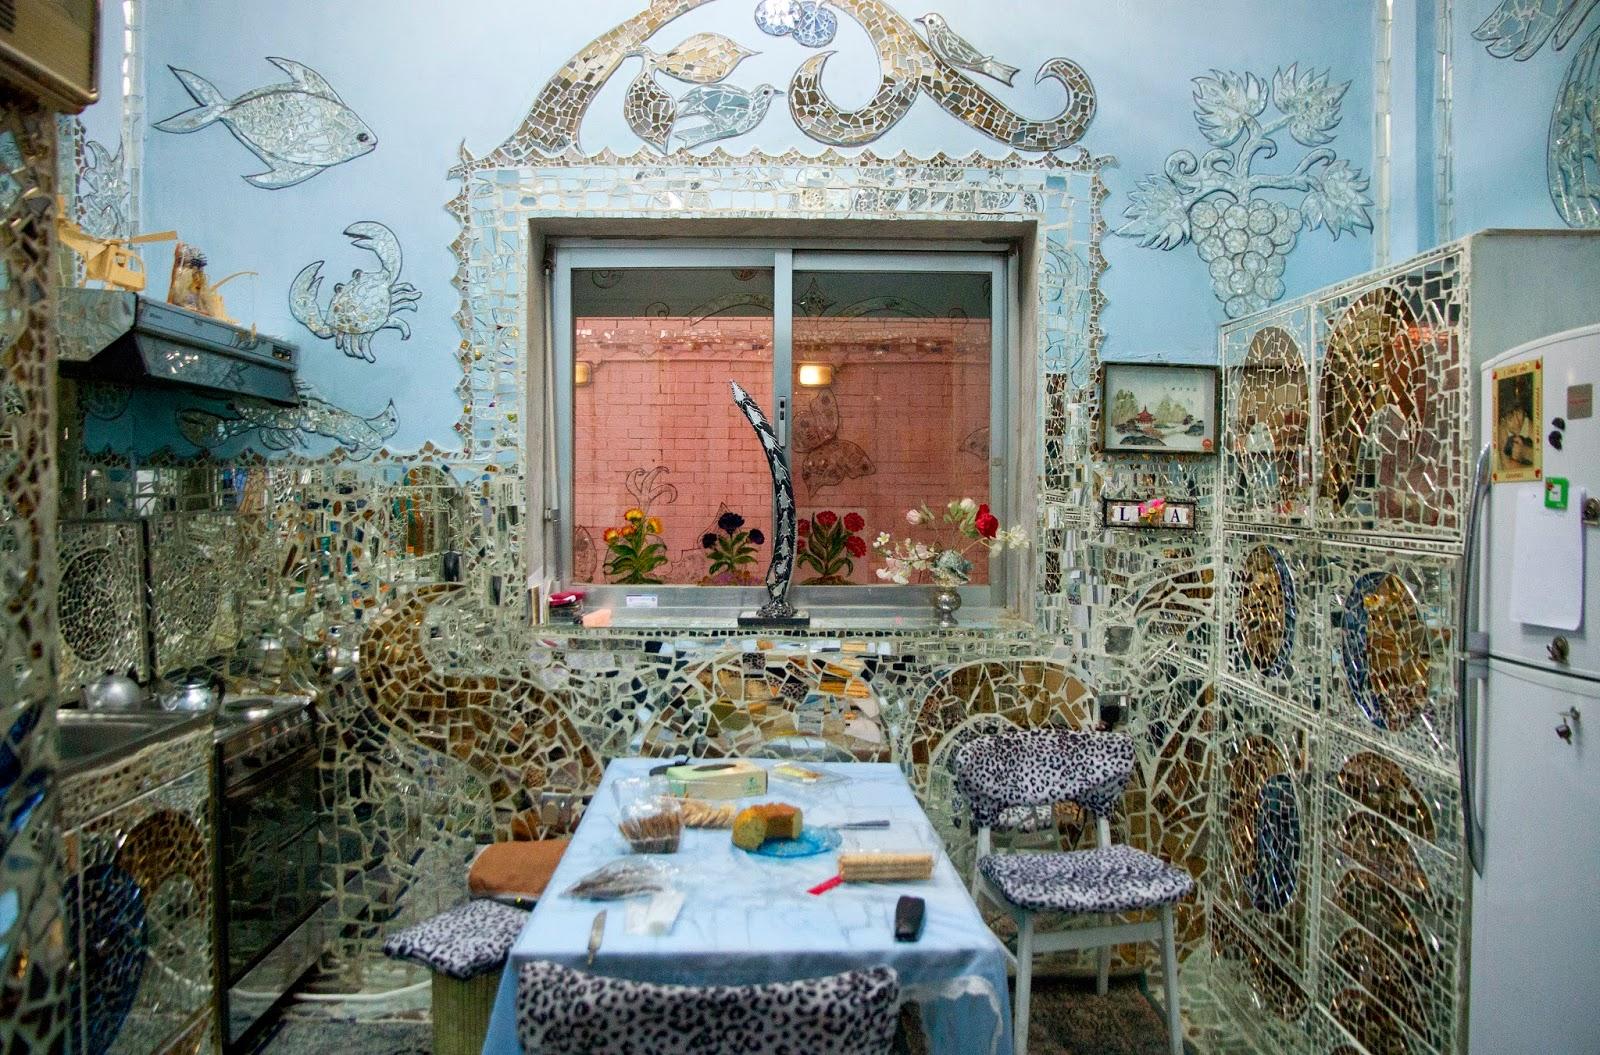 I Am Samantha Rose The House Of Mirrors Kuwait